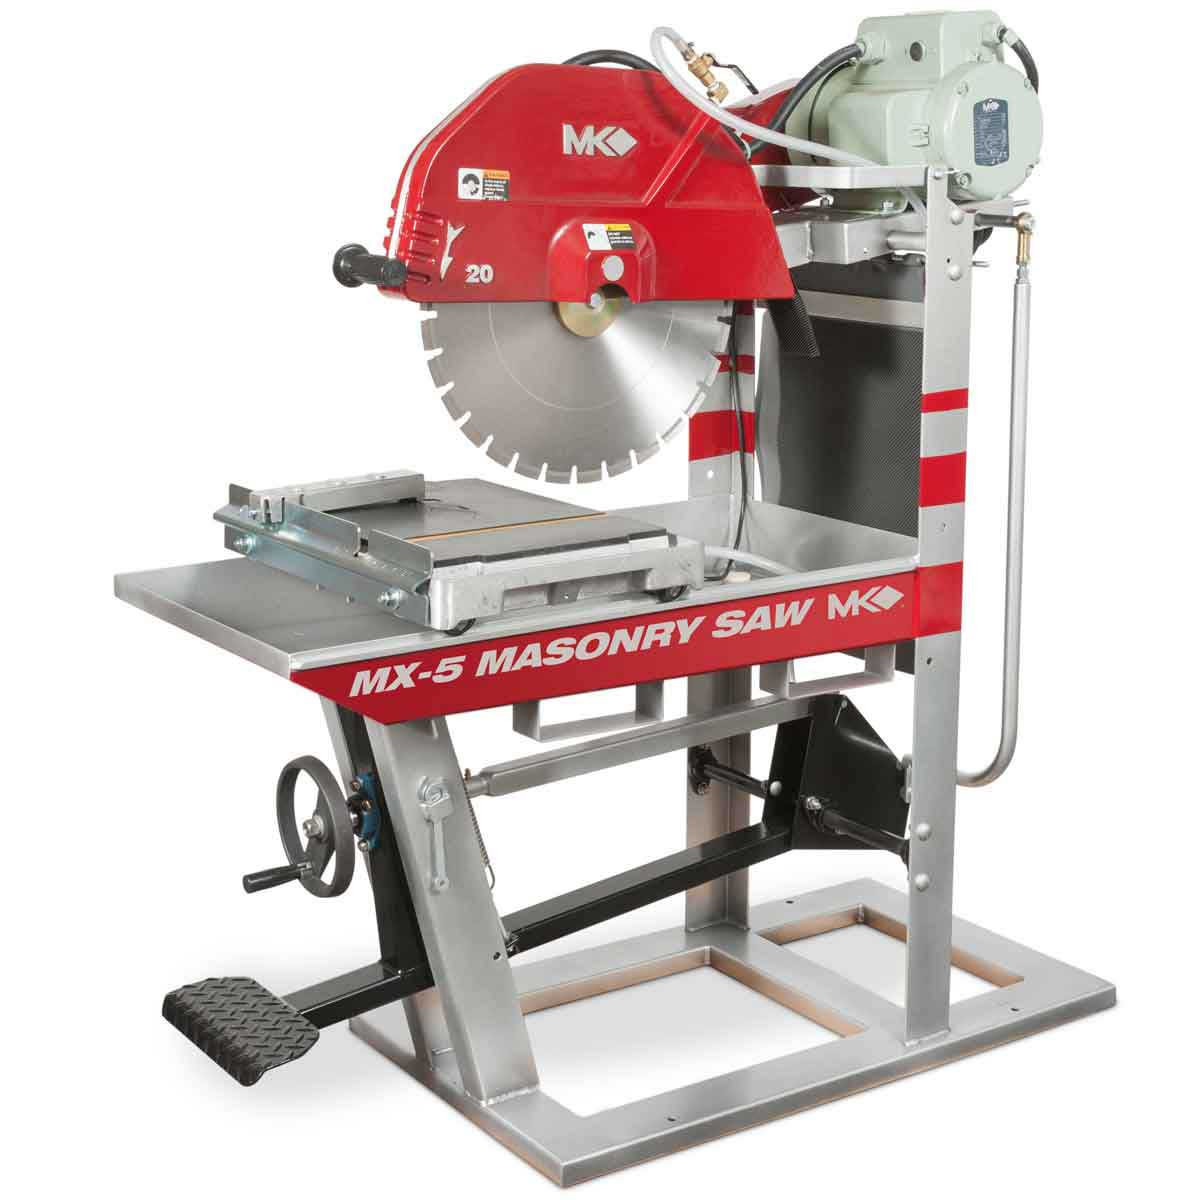 MK MX-5 Electric 20 inch Block Saw